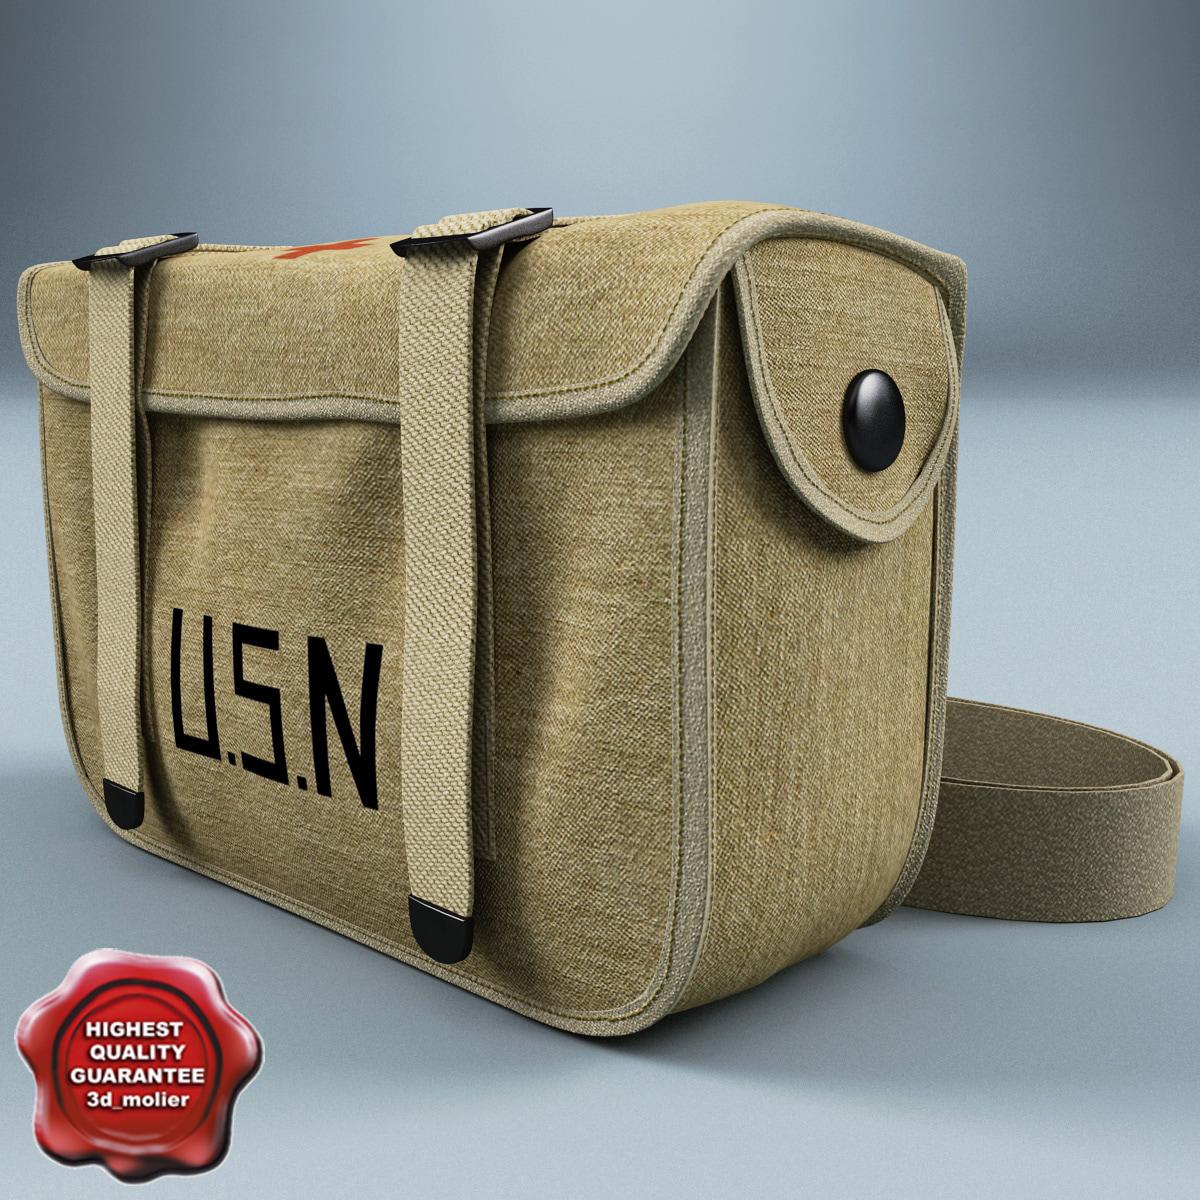 USN_Military_First_Aid_Kit_00.jpg